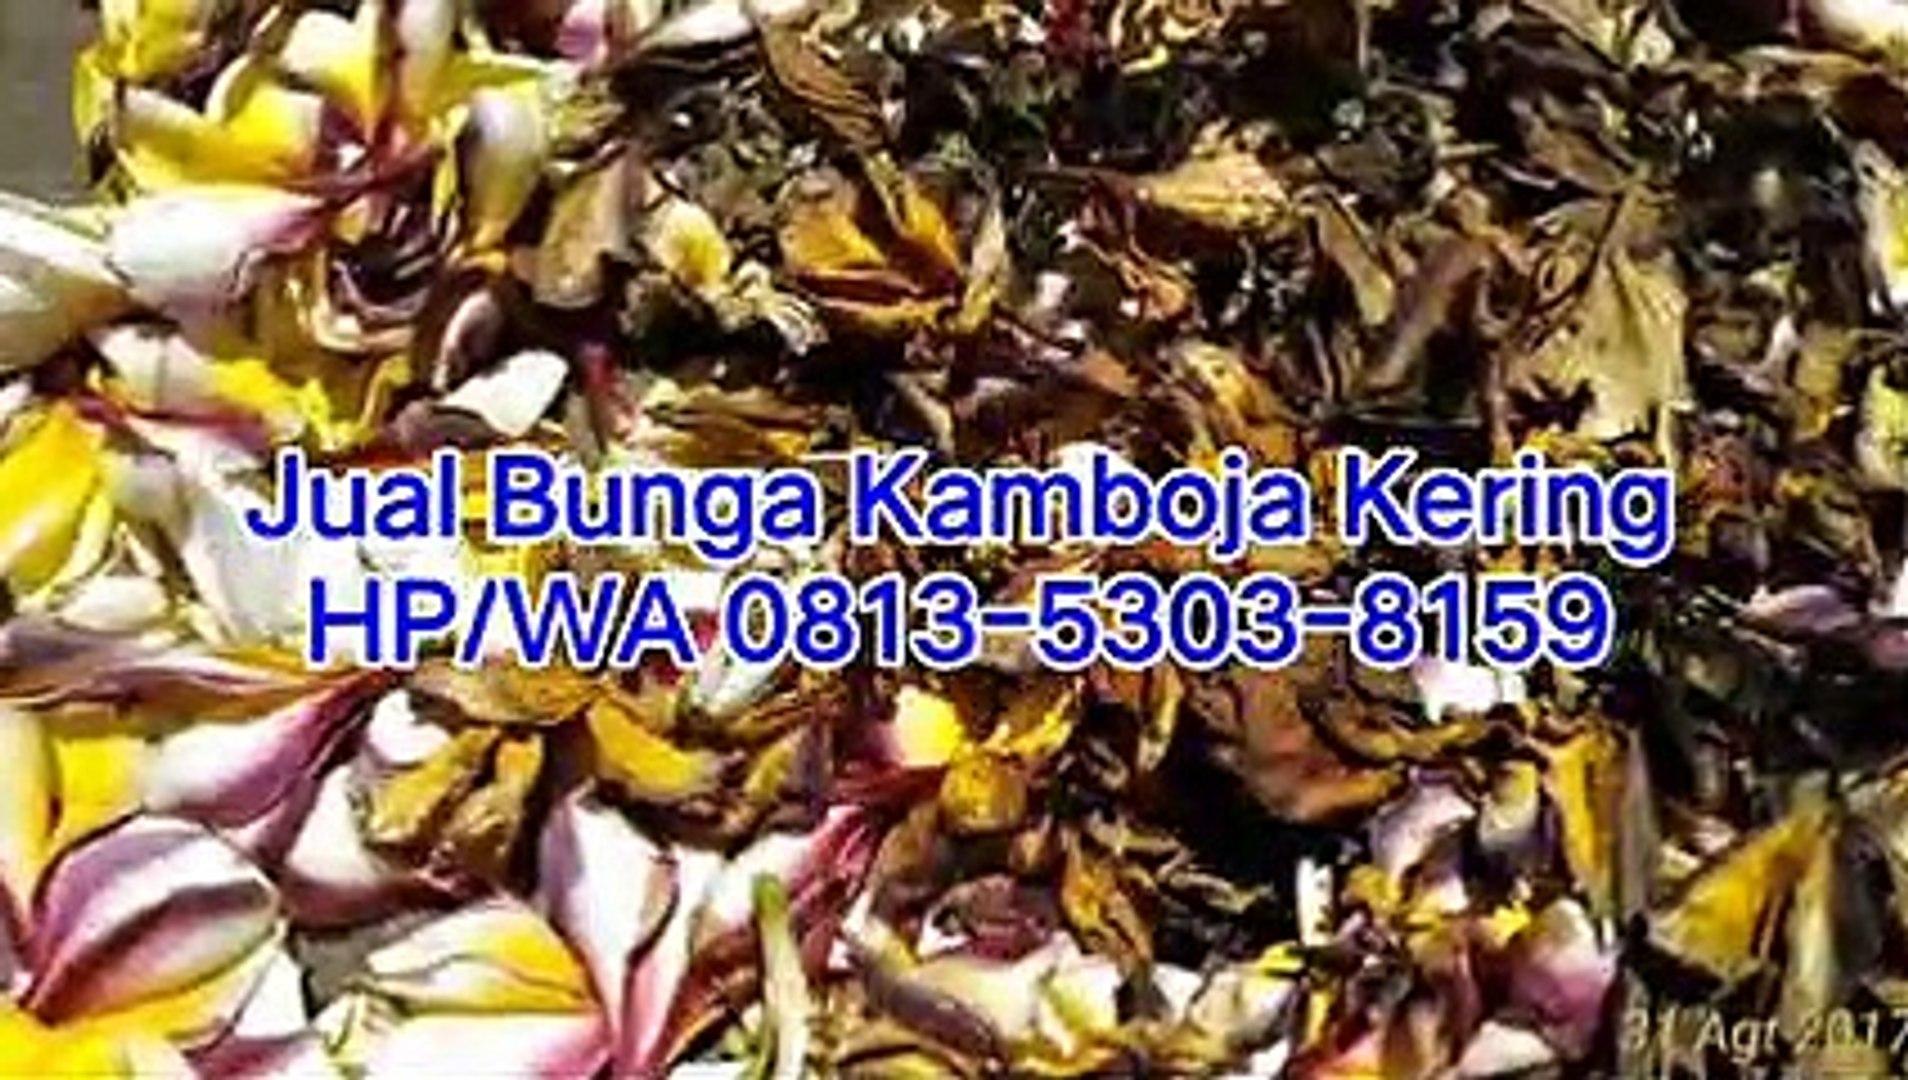 TERMURAH!!! HP/WA 0813-5303-8159, Jual Kamboja Kering di Surabaya